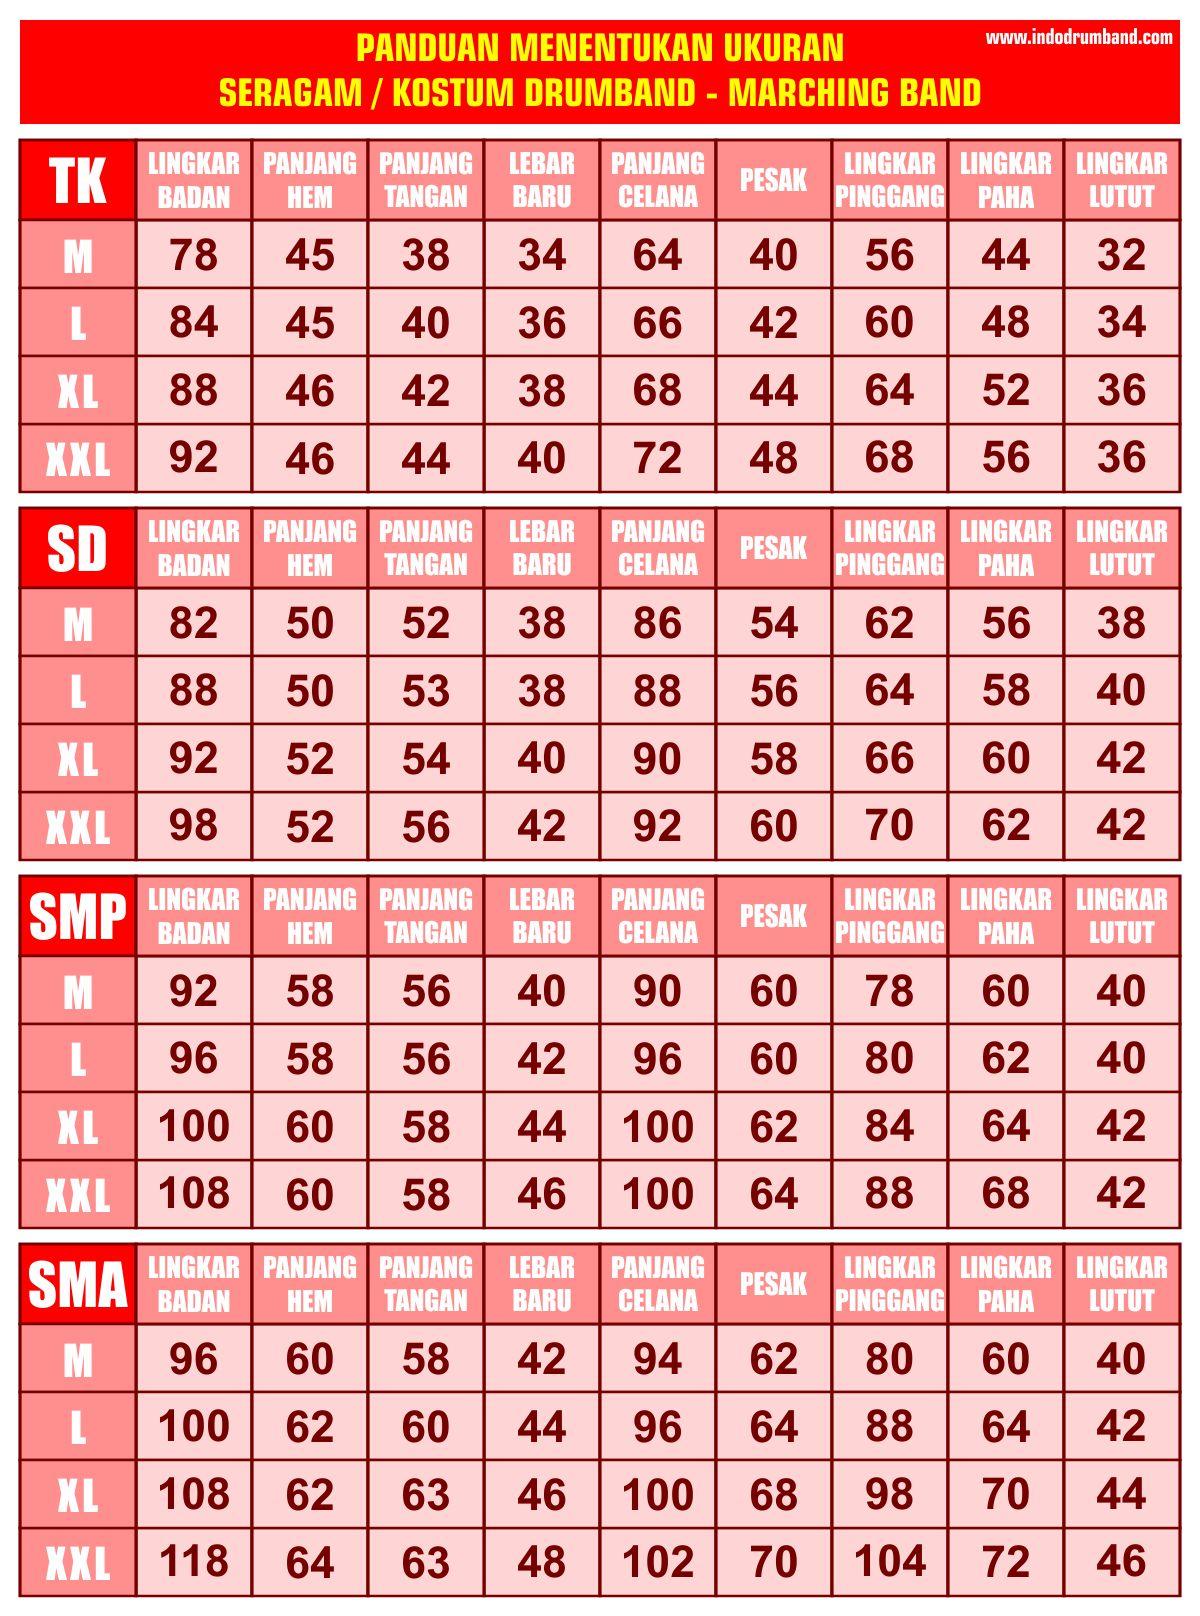 Harga ID Ukuran Seragam 2019